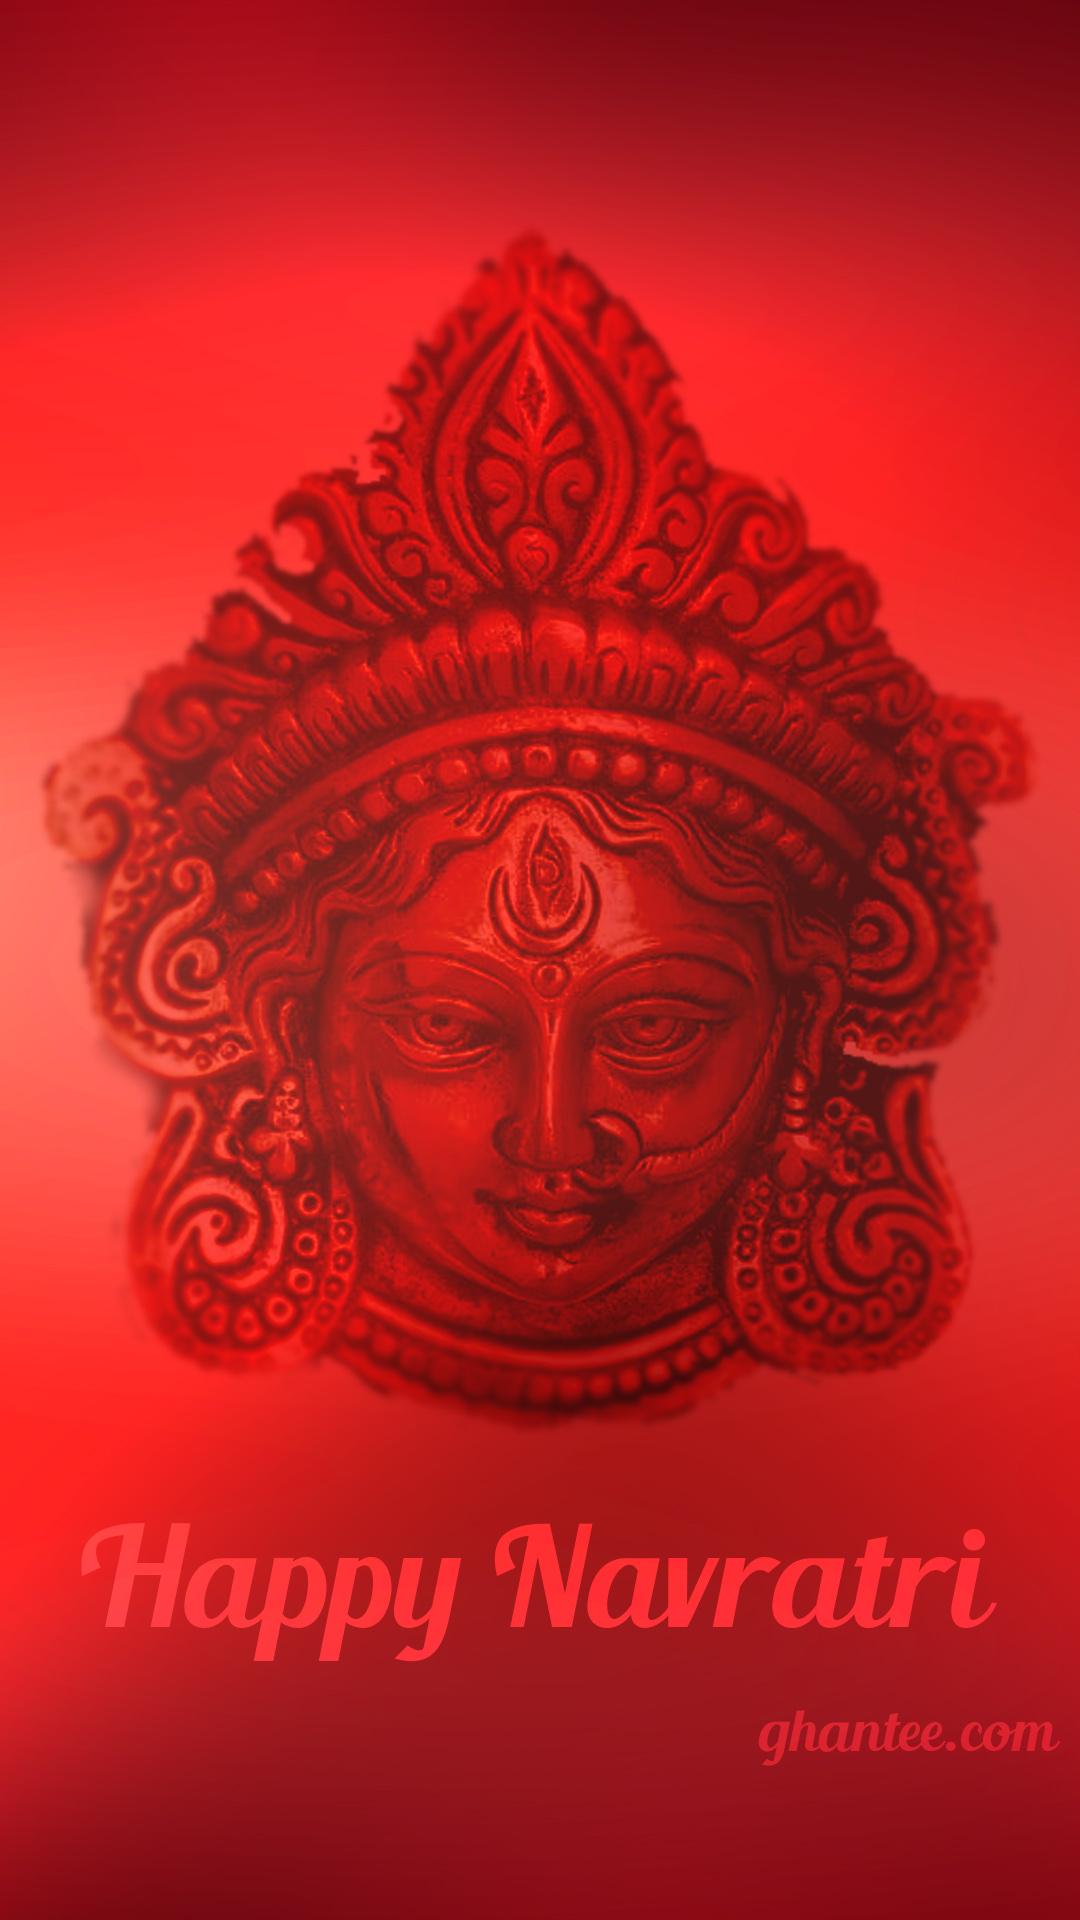 navratri wallpaper for mobile hd 1080p